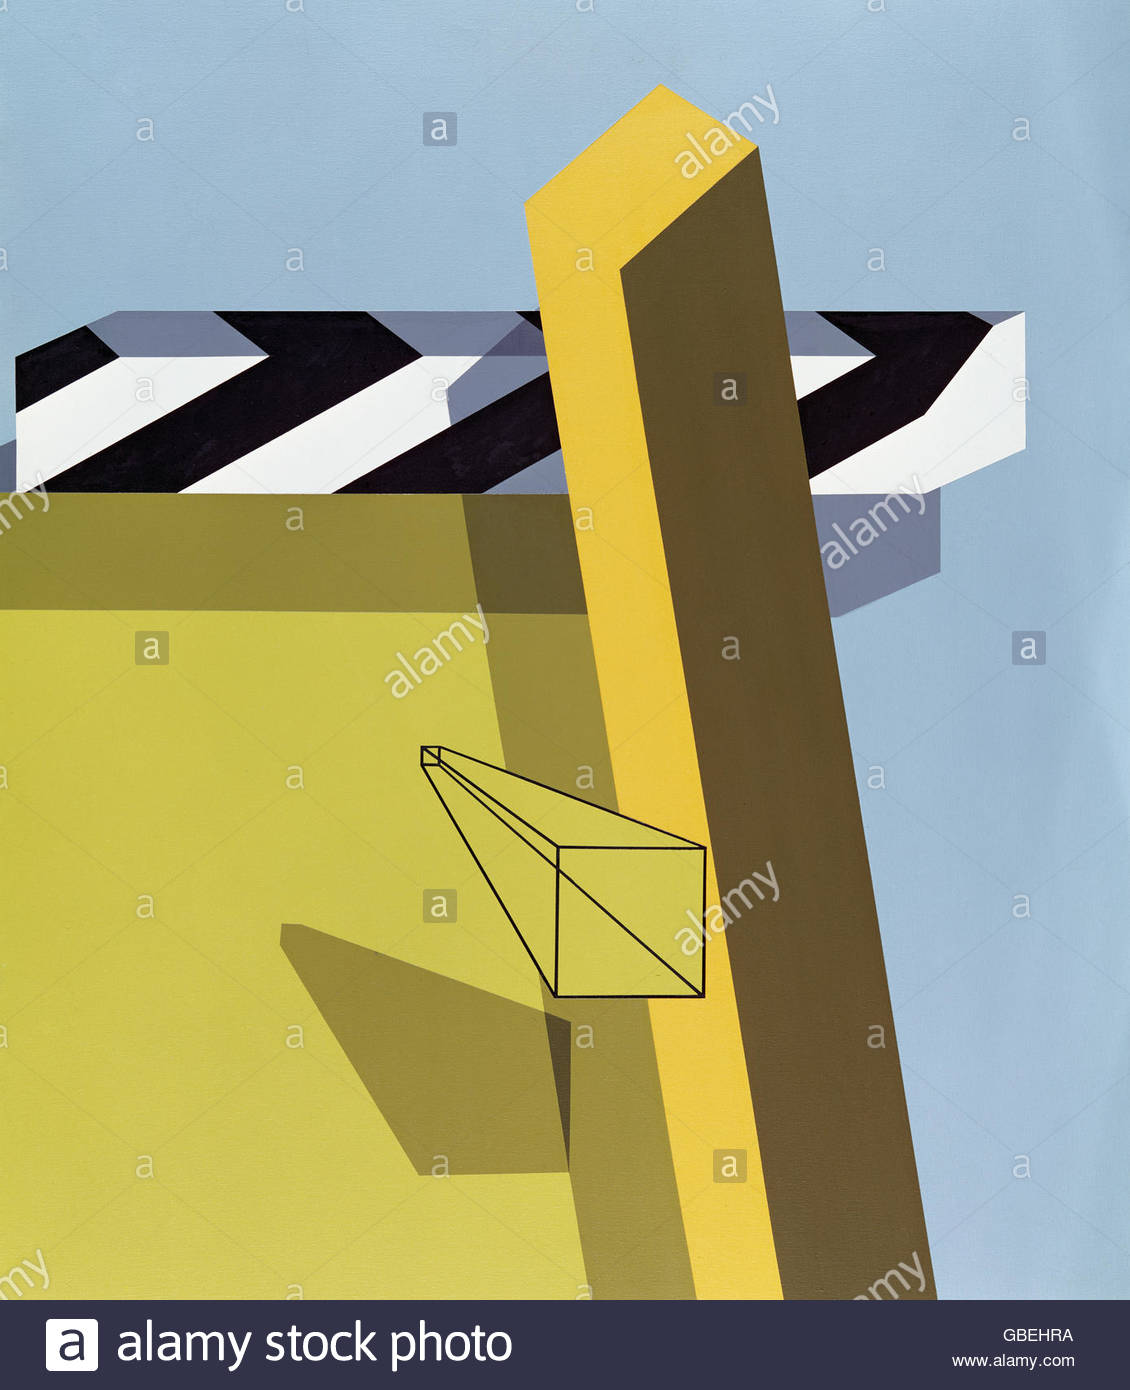 "Bildende Kunst, d ' Arcangelo, Allan, (1930-1998), Malerei, ""Landschaft"", 1968, Suermondt Museum, Stockbild"